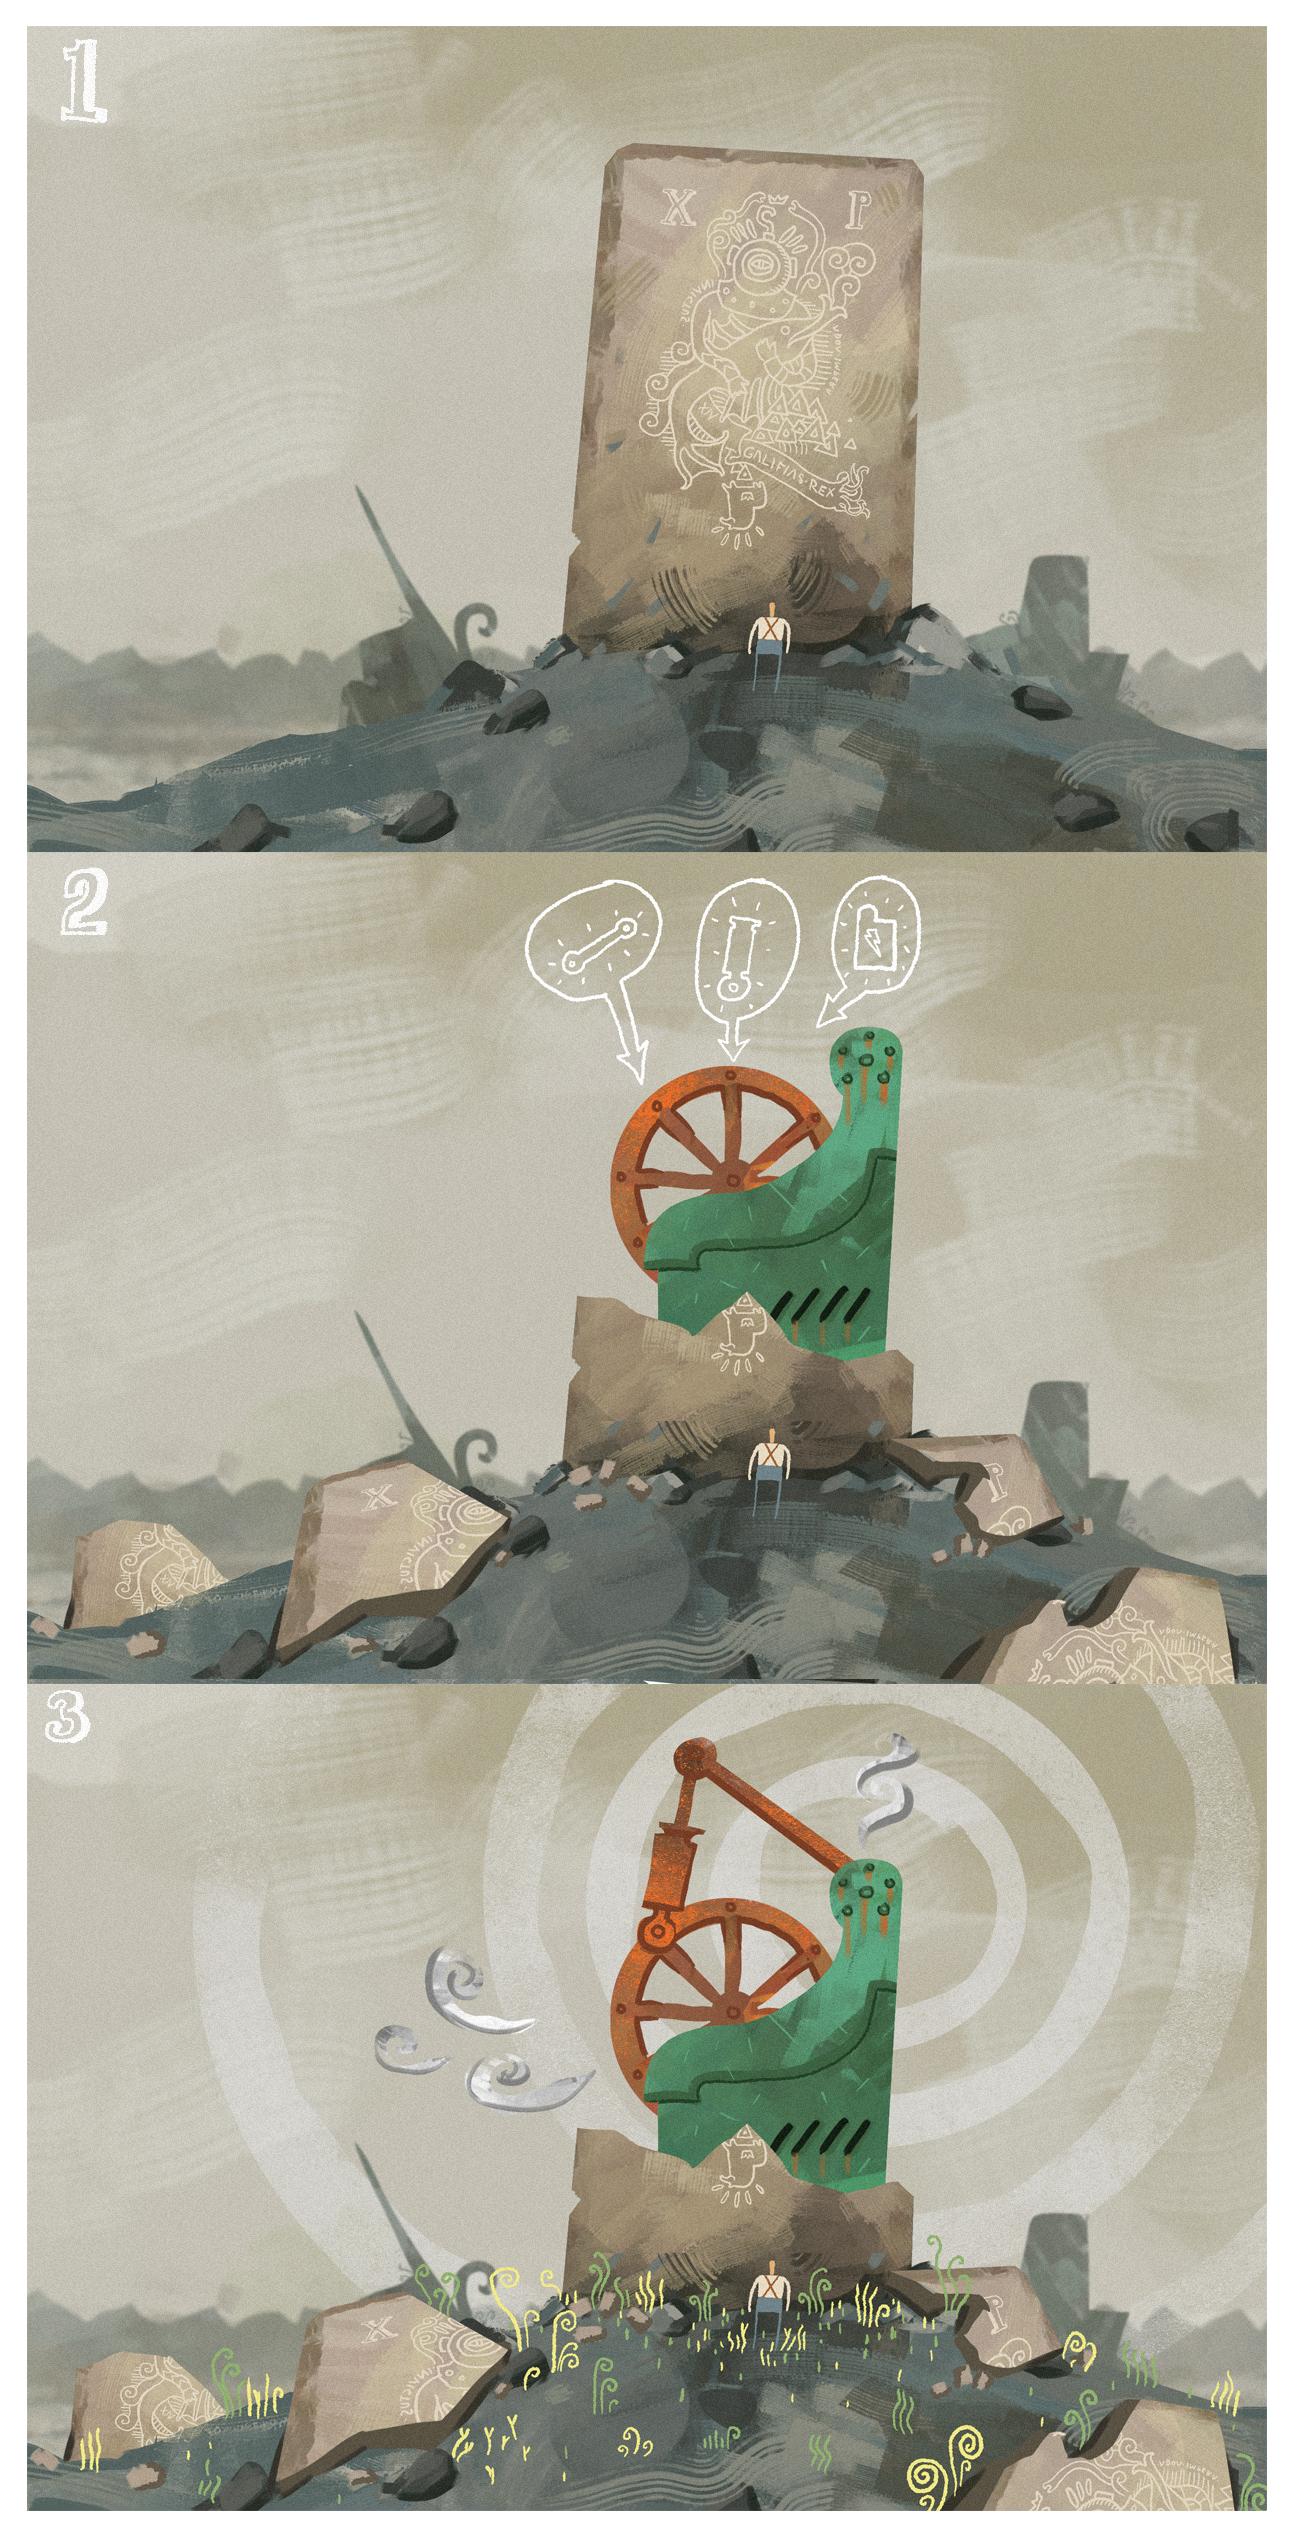 Hidden Machinery by Marcodalidingo